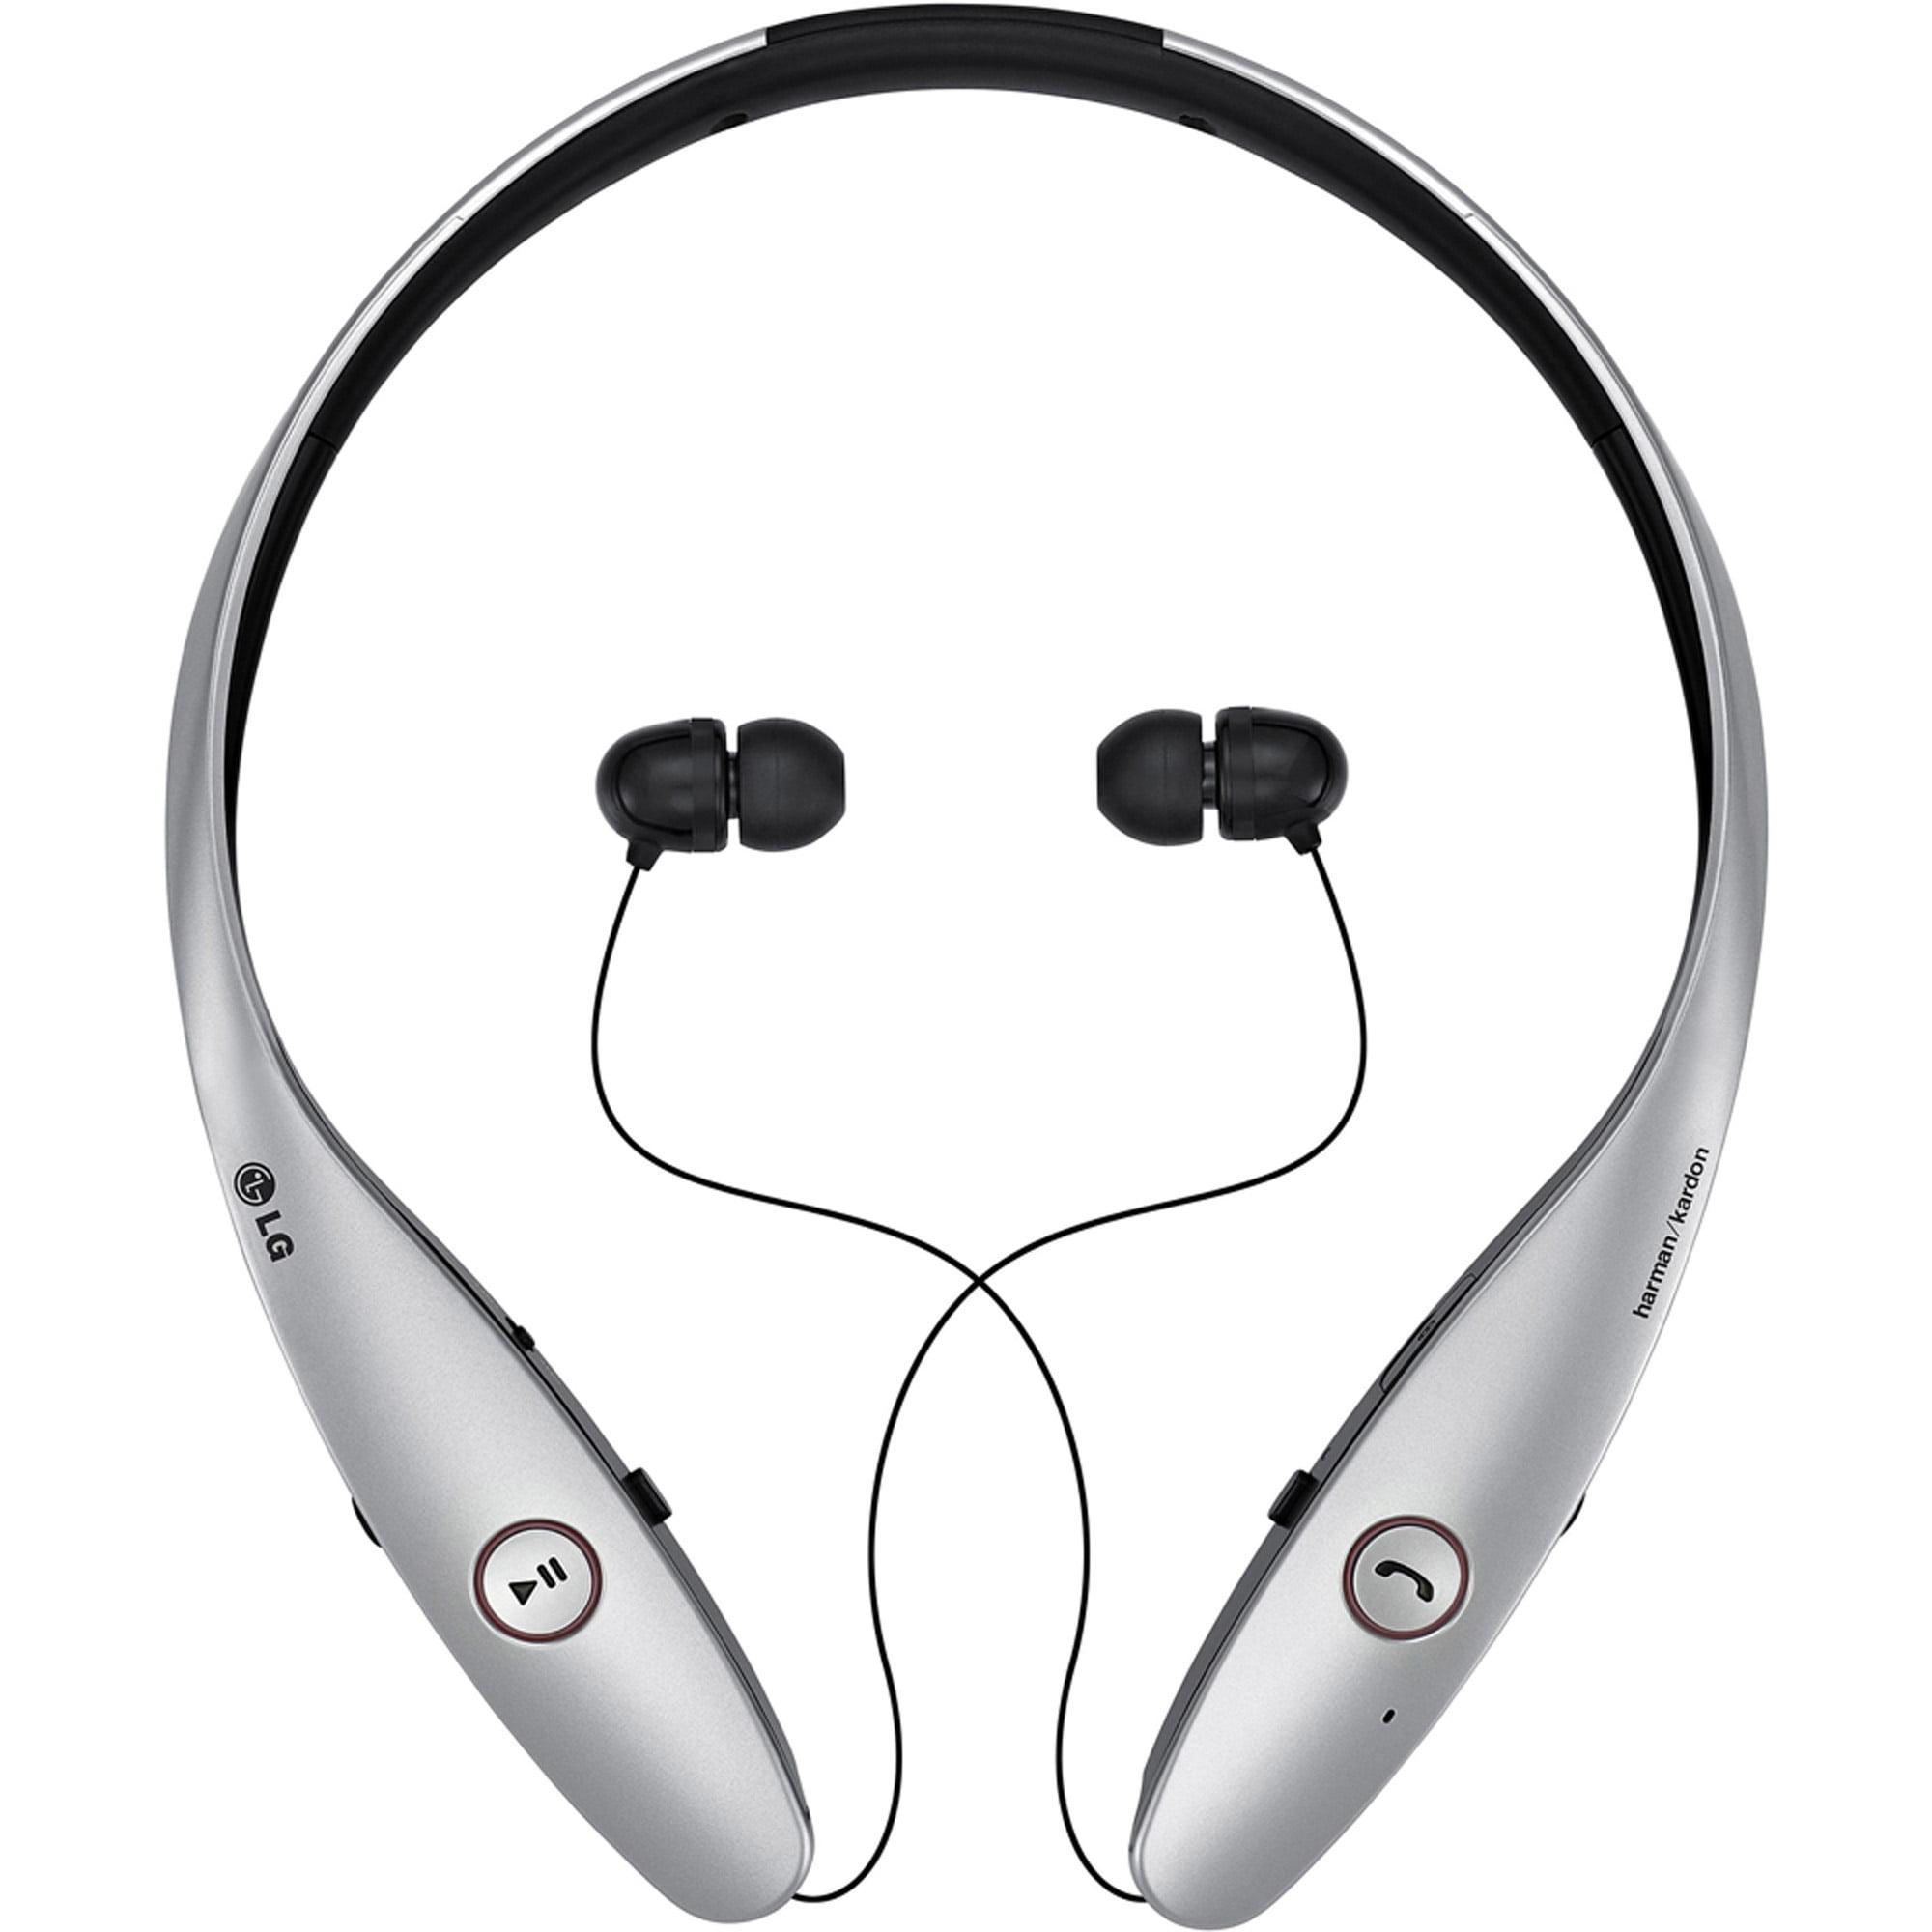 370812ff 4e40 4099 a0b9 4d3647f88c13_1.9c04a05e0281fec21c4814031d40127c plantronics voyager edge uc b255 usb bluetooth headset walmart com I LG Tone Infinim at edmiracle.co